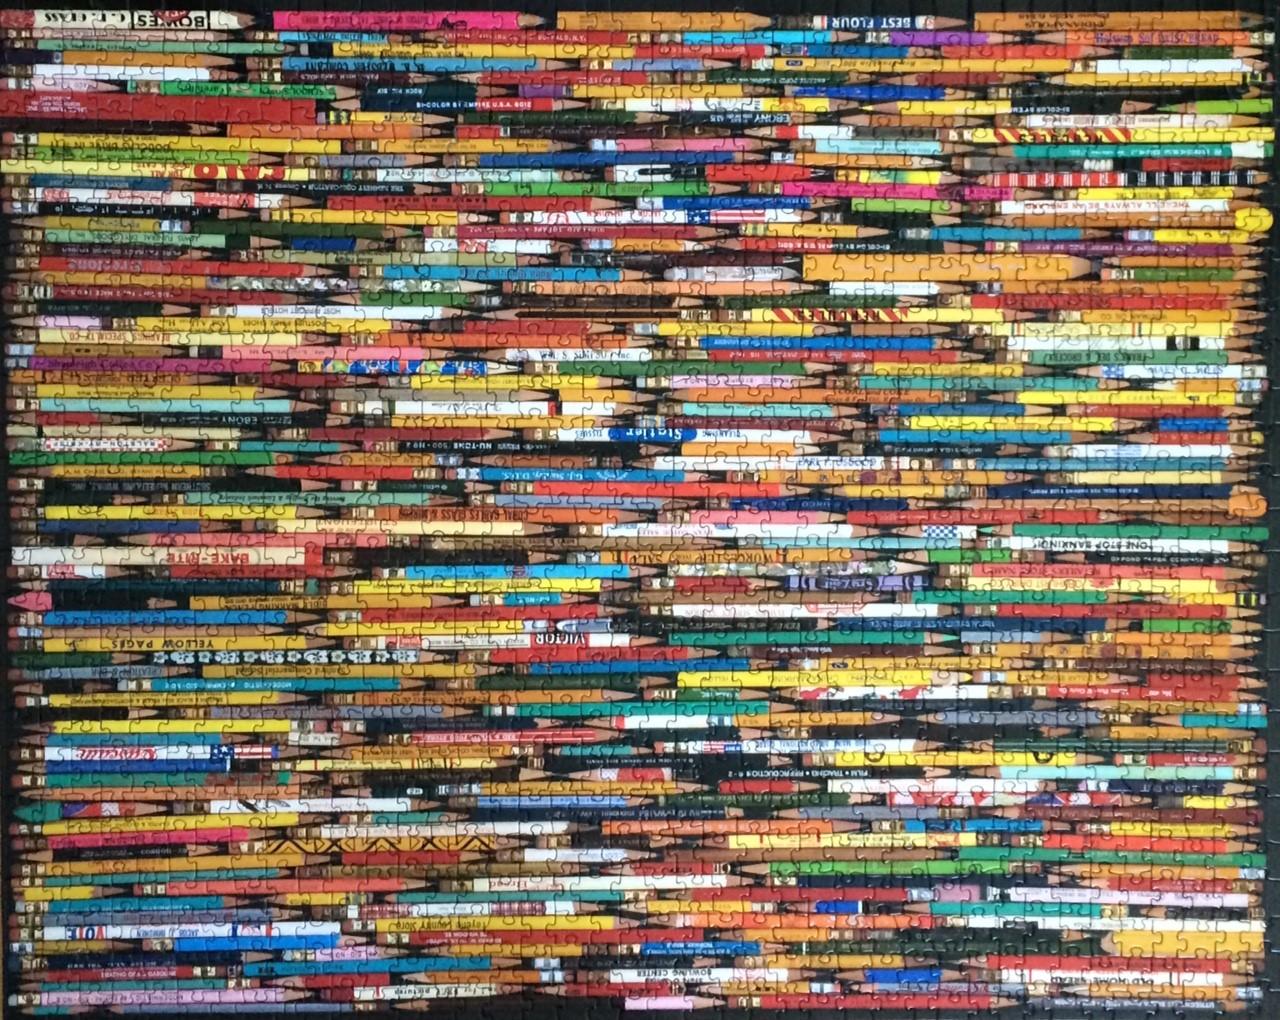 pencilpuzzle.jpg